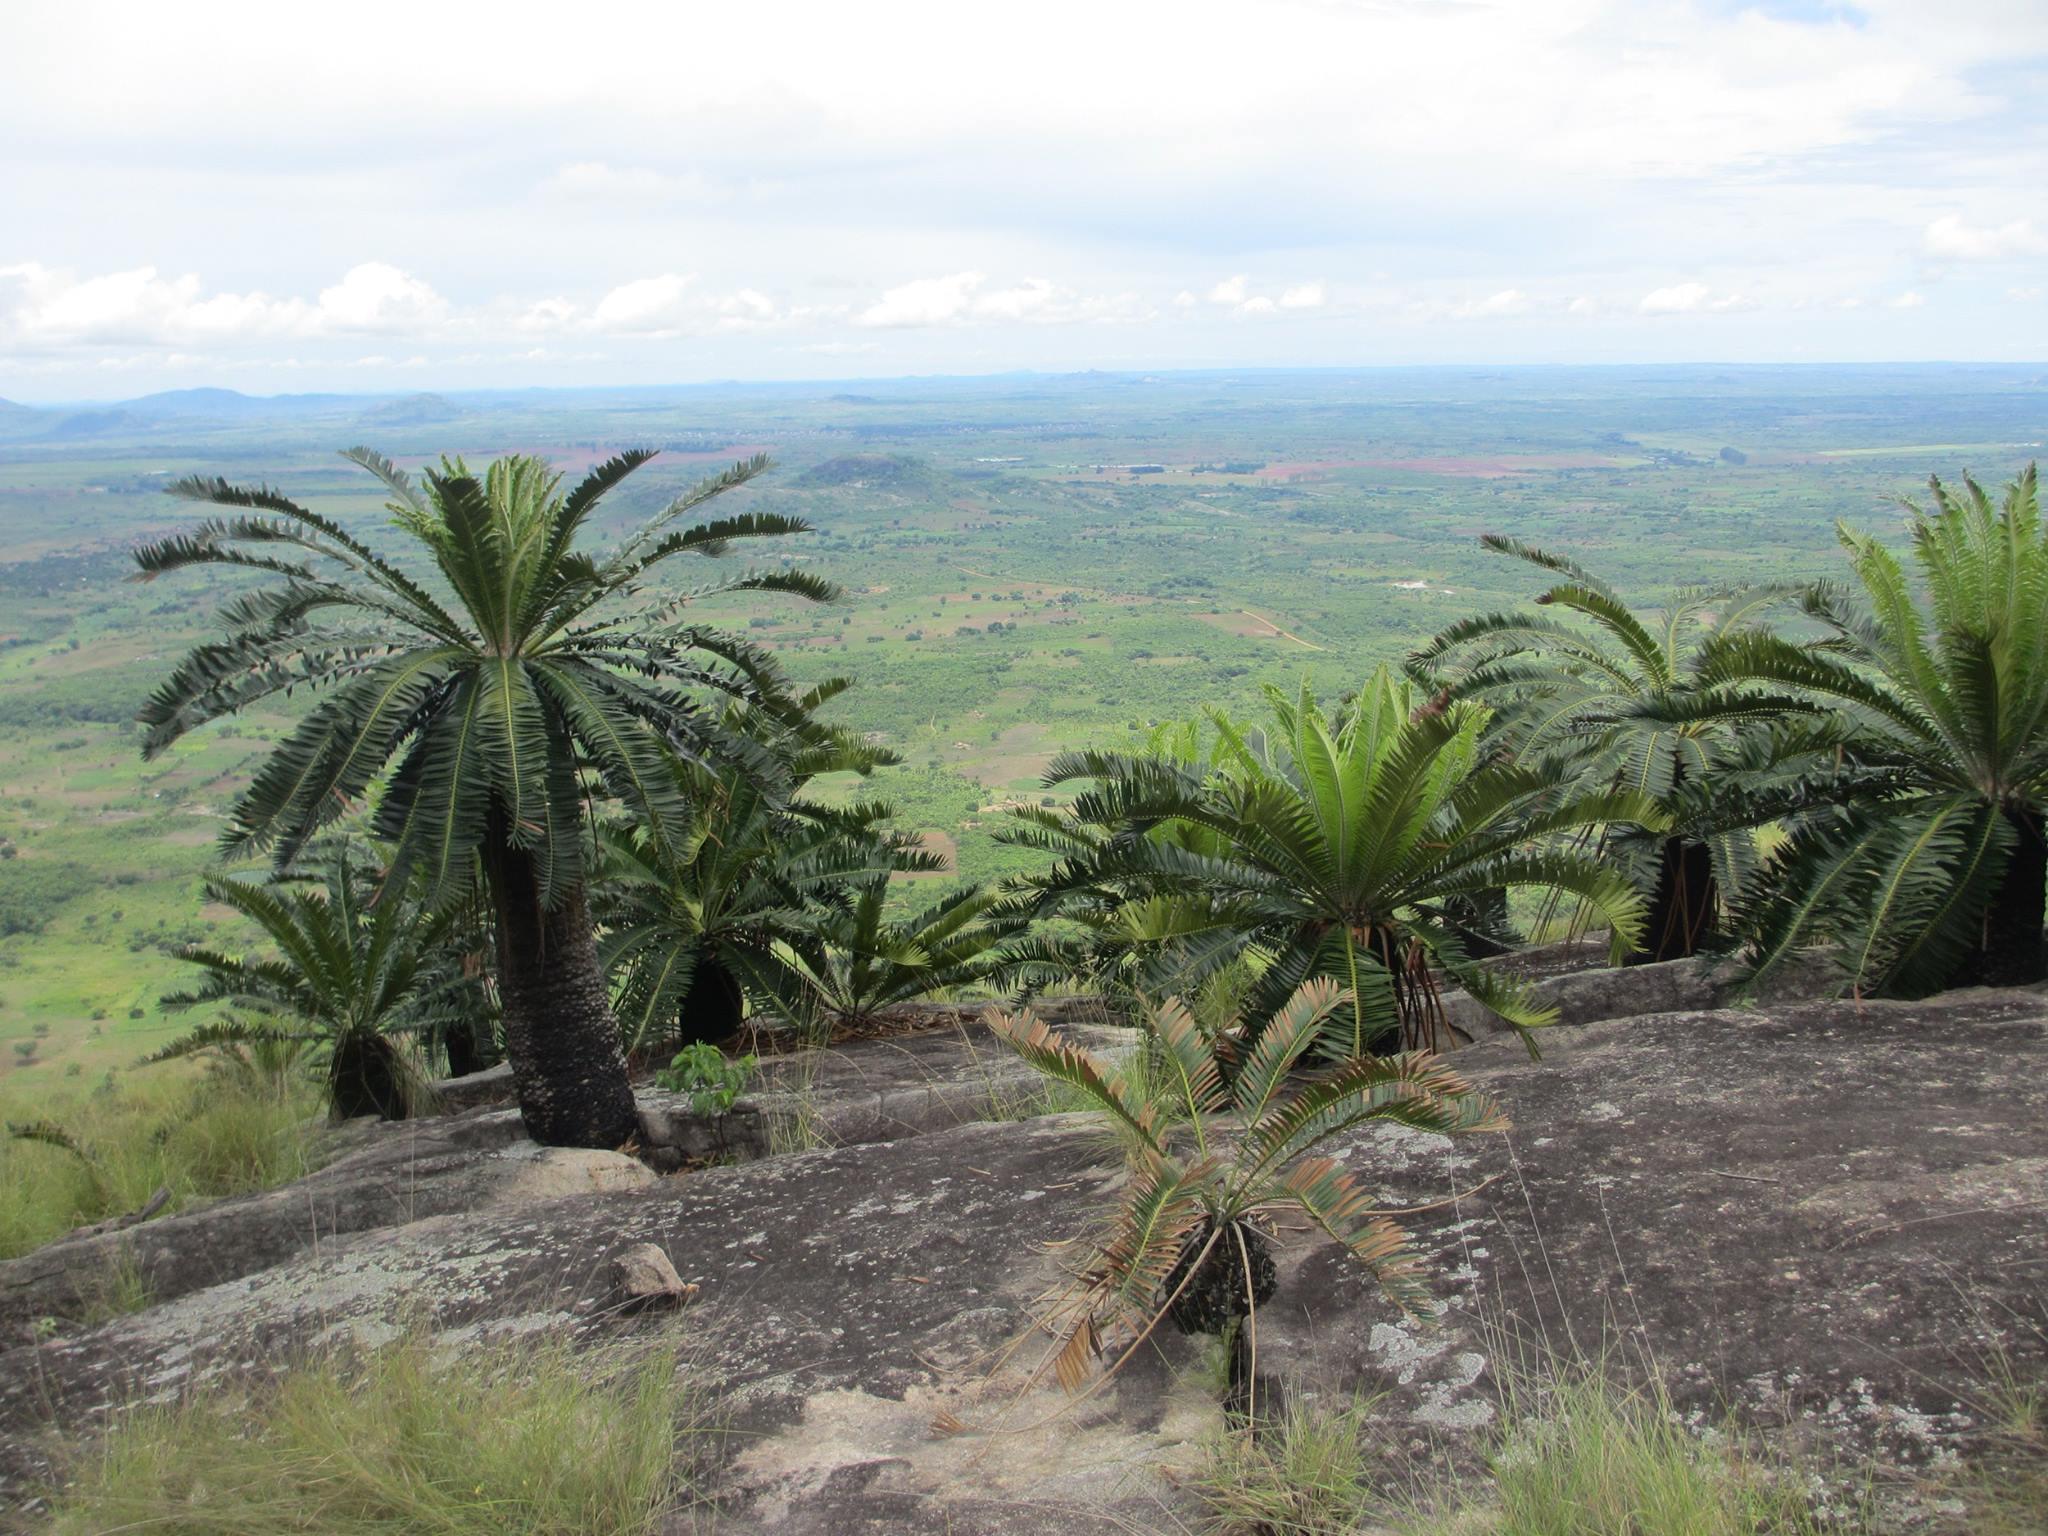 Encephalartos manikensis from Garuzo mount in Manica Province center of Mozambique